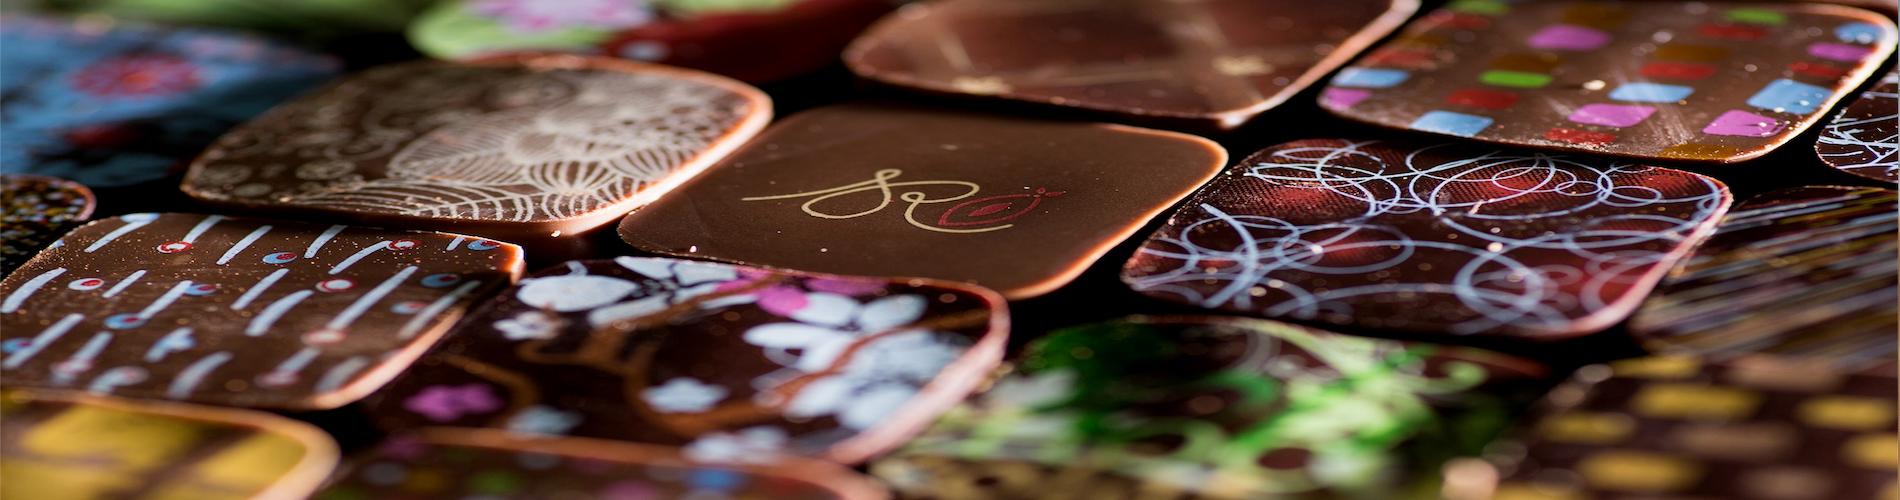 Stéphane Roux - L'art Chocolatier